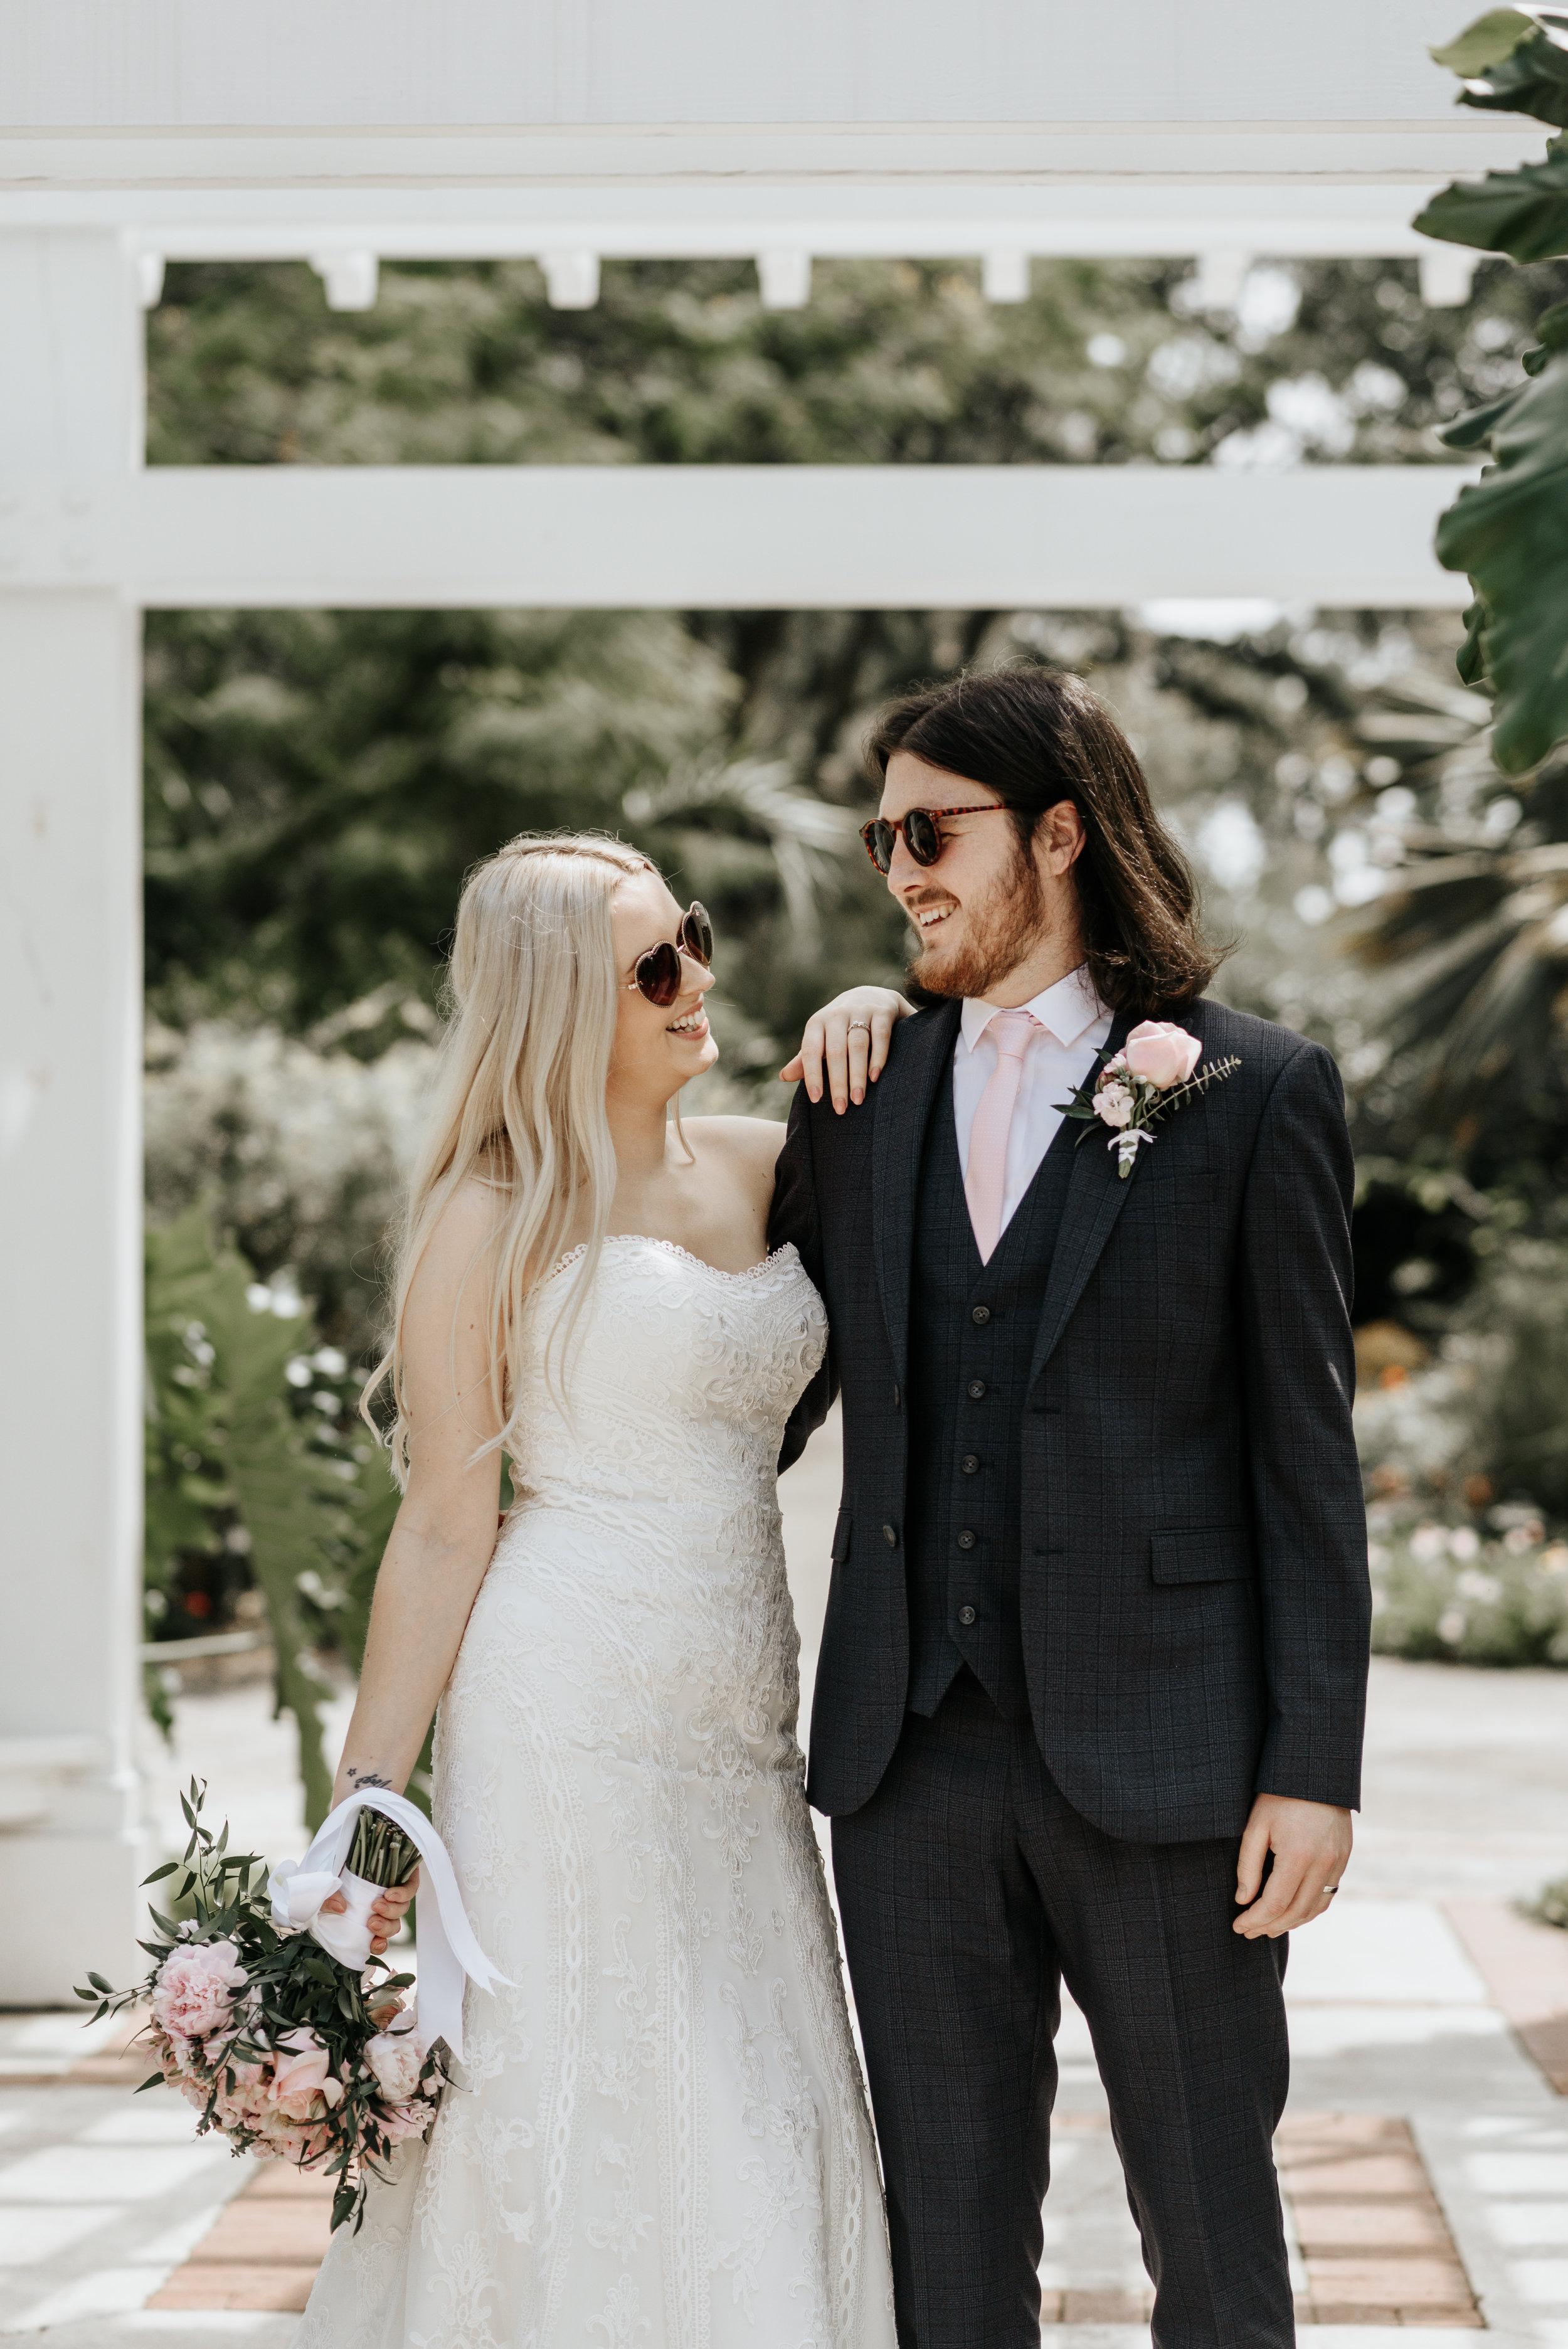 Lora-Richard-Wedding-1172.jpg